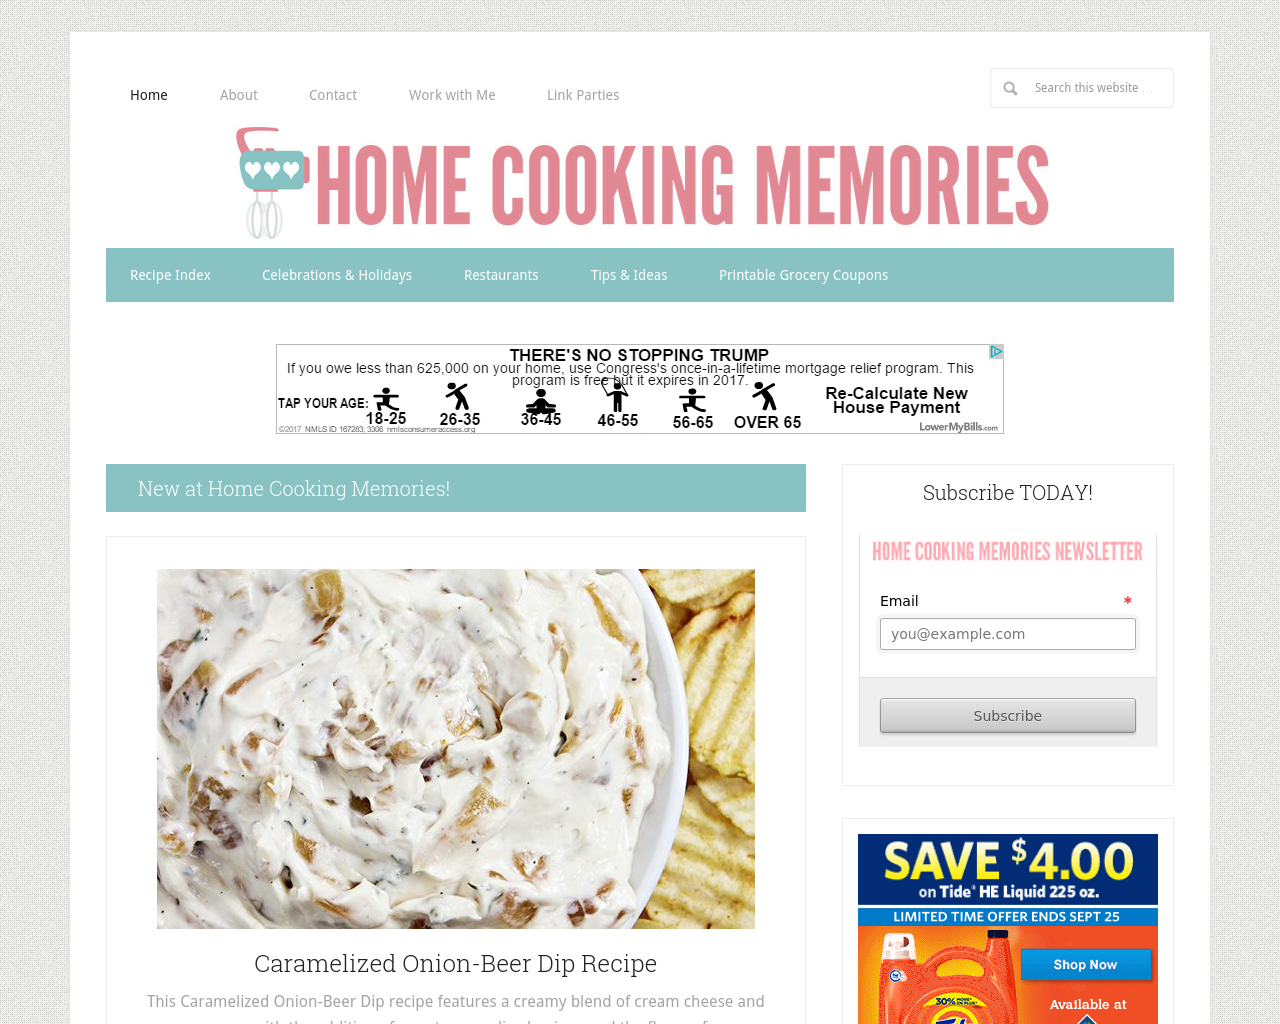 Home-Cooking-Memories-Advertising-Reviews-Pricing